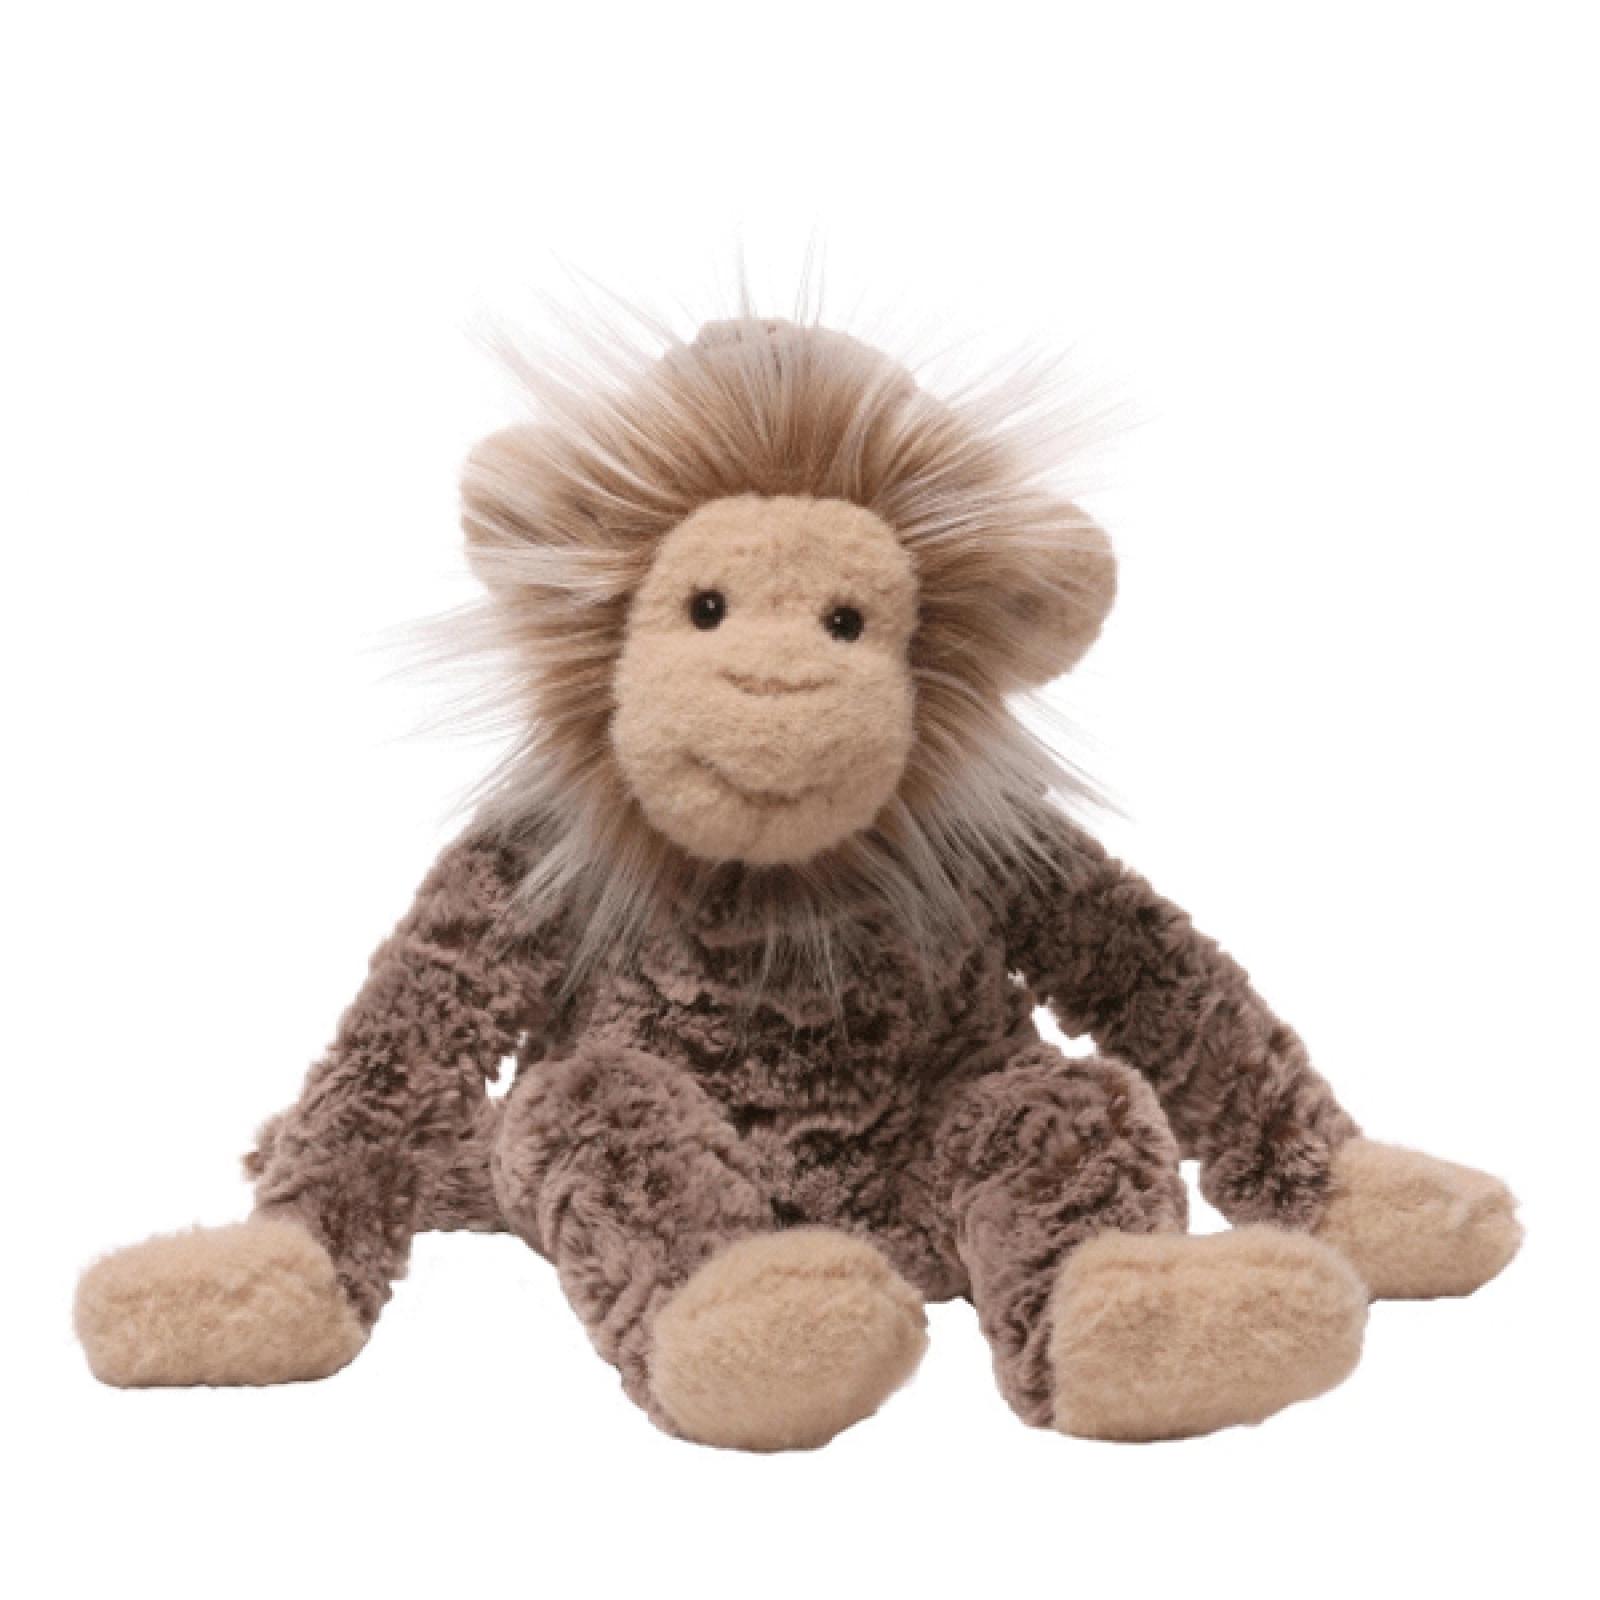 Wrigley Monkey Soft Toy 1yr+